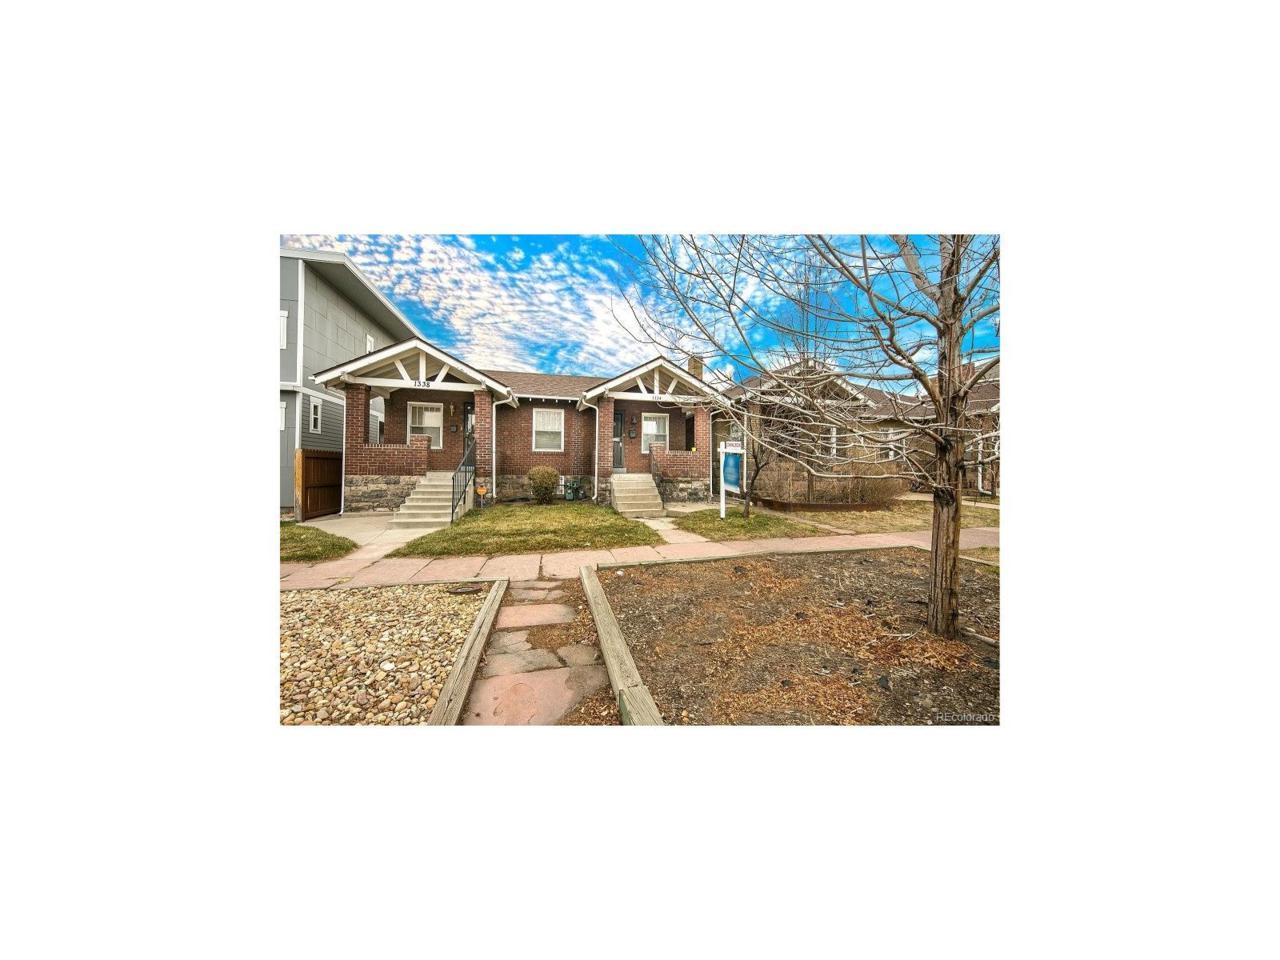 1334 Mariposa Street, Denver, CO 80204 (MLS #8837994) :: 8z Real Estate